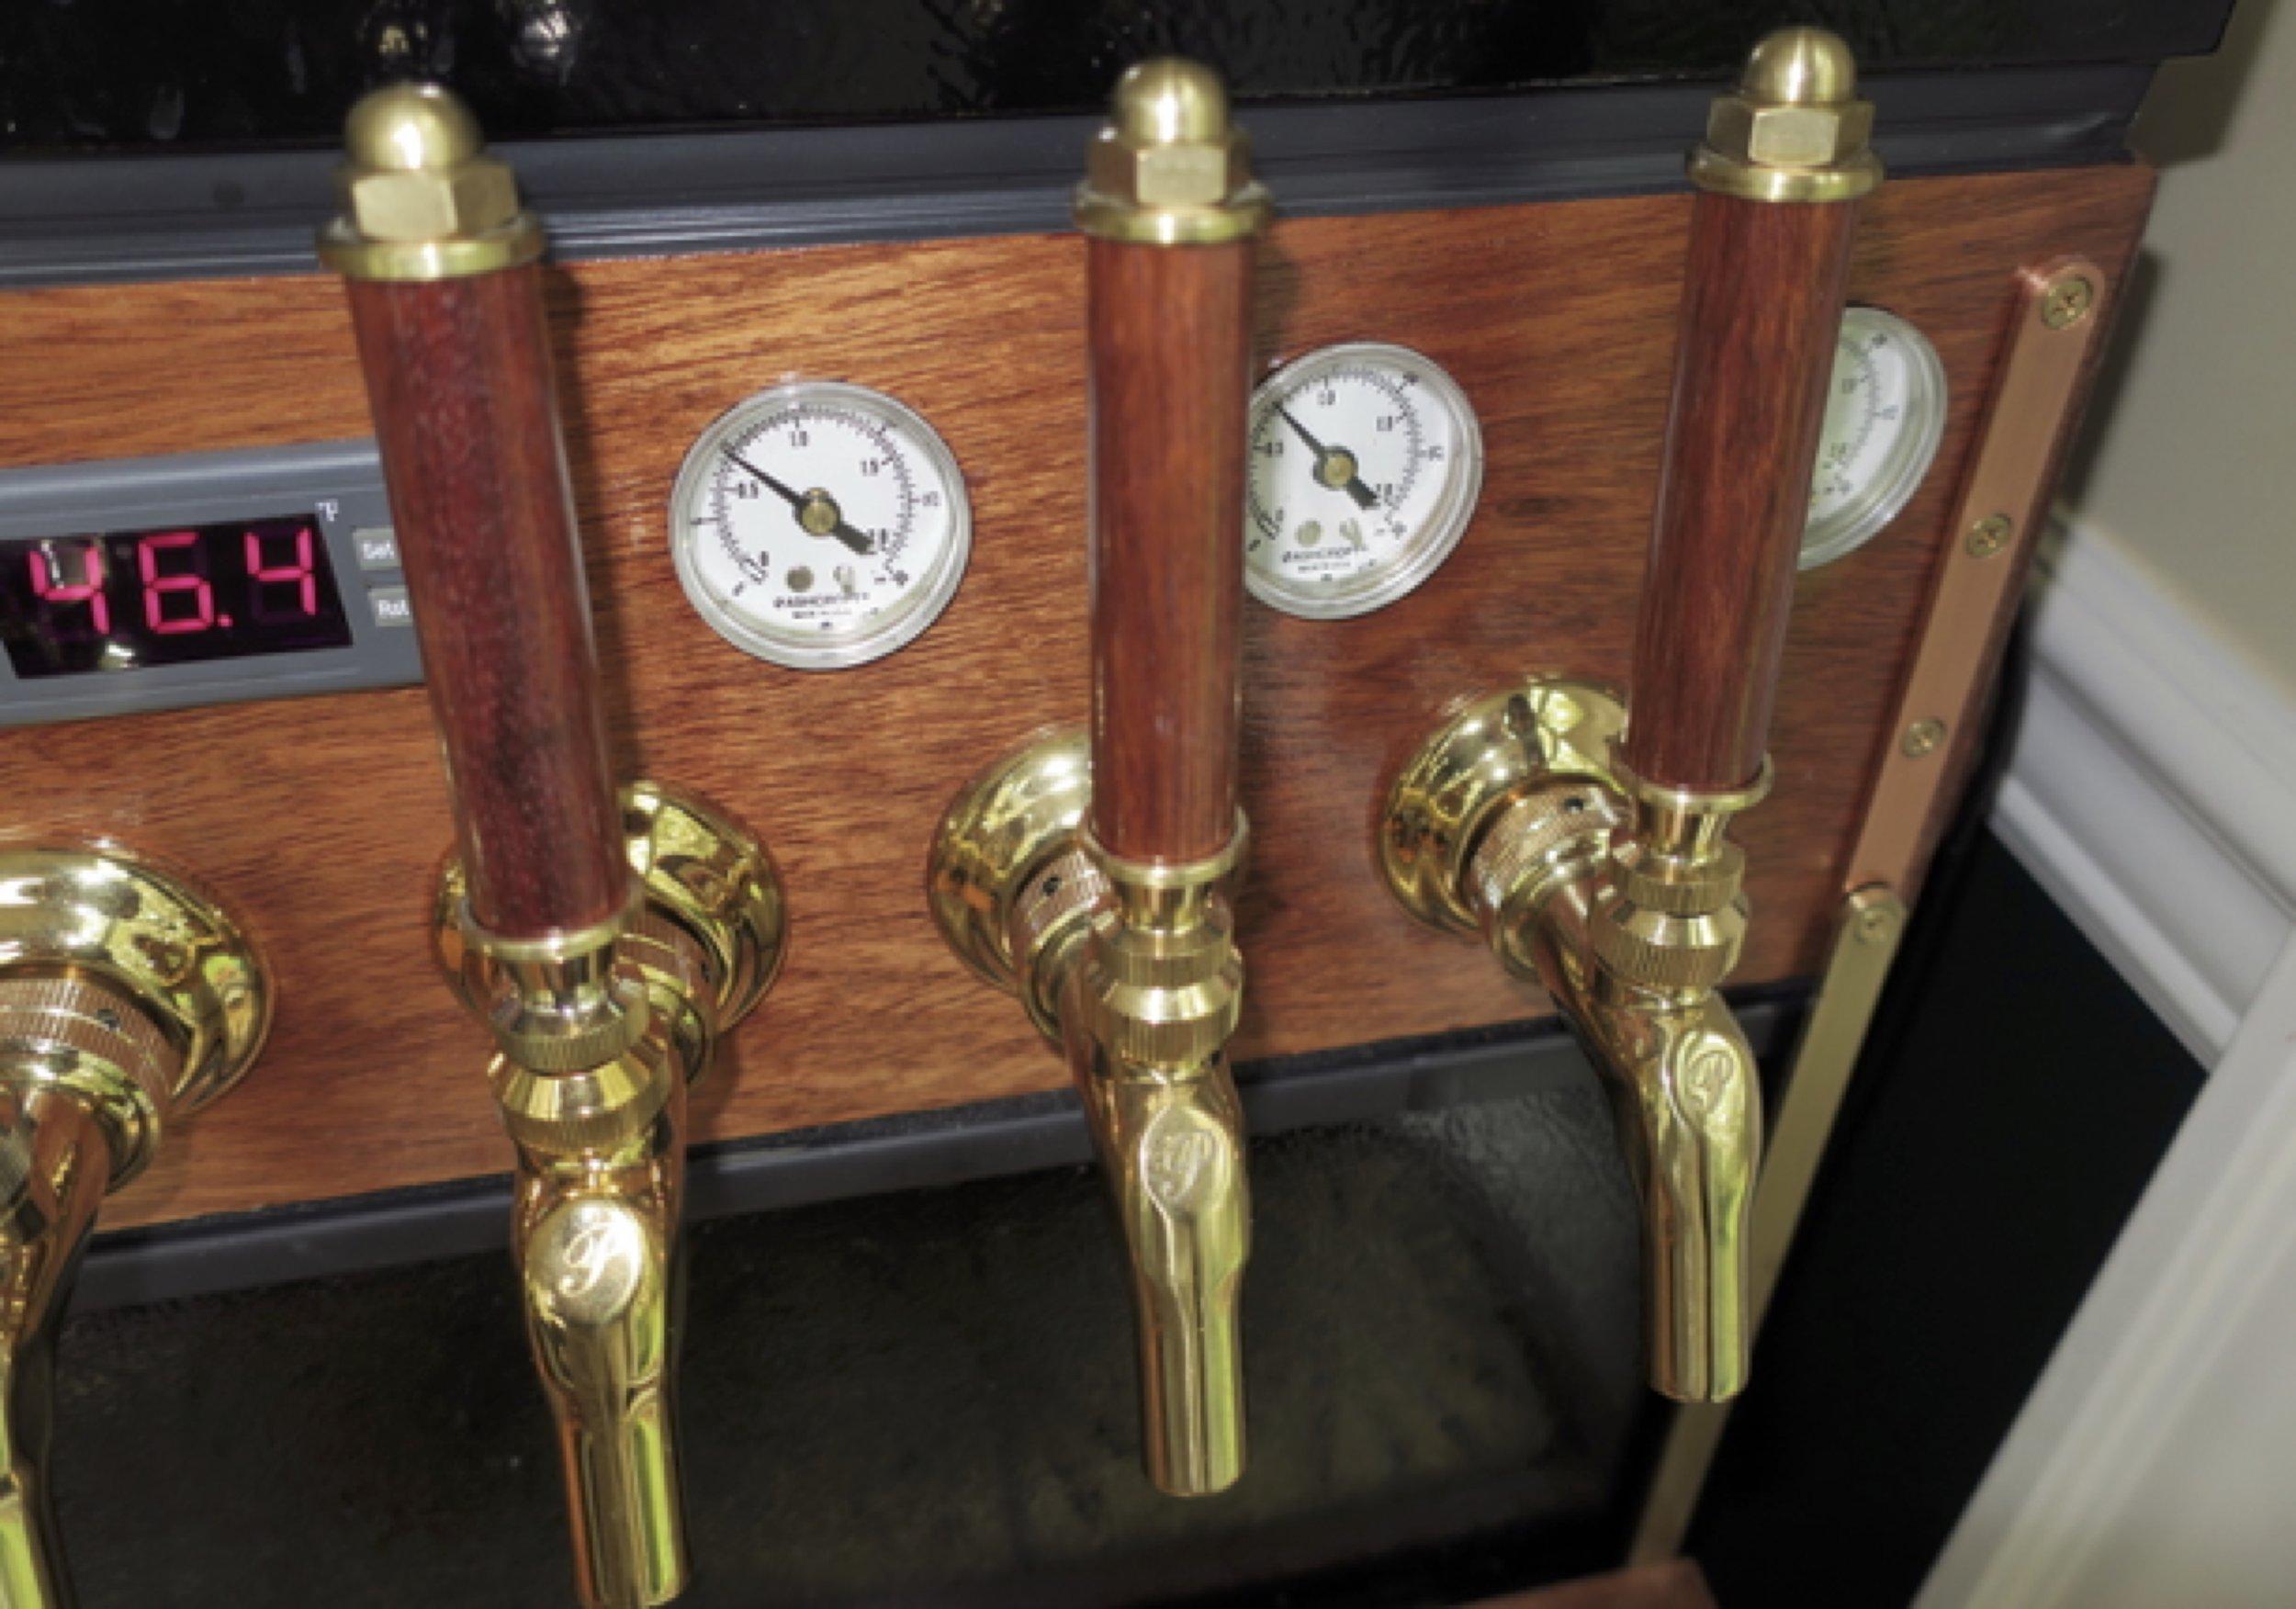 Pressure gauges on the tap for each keg.